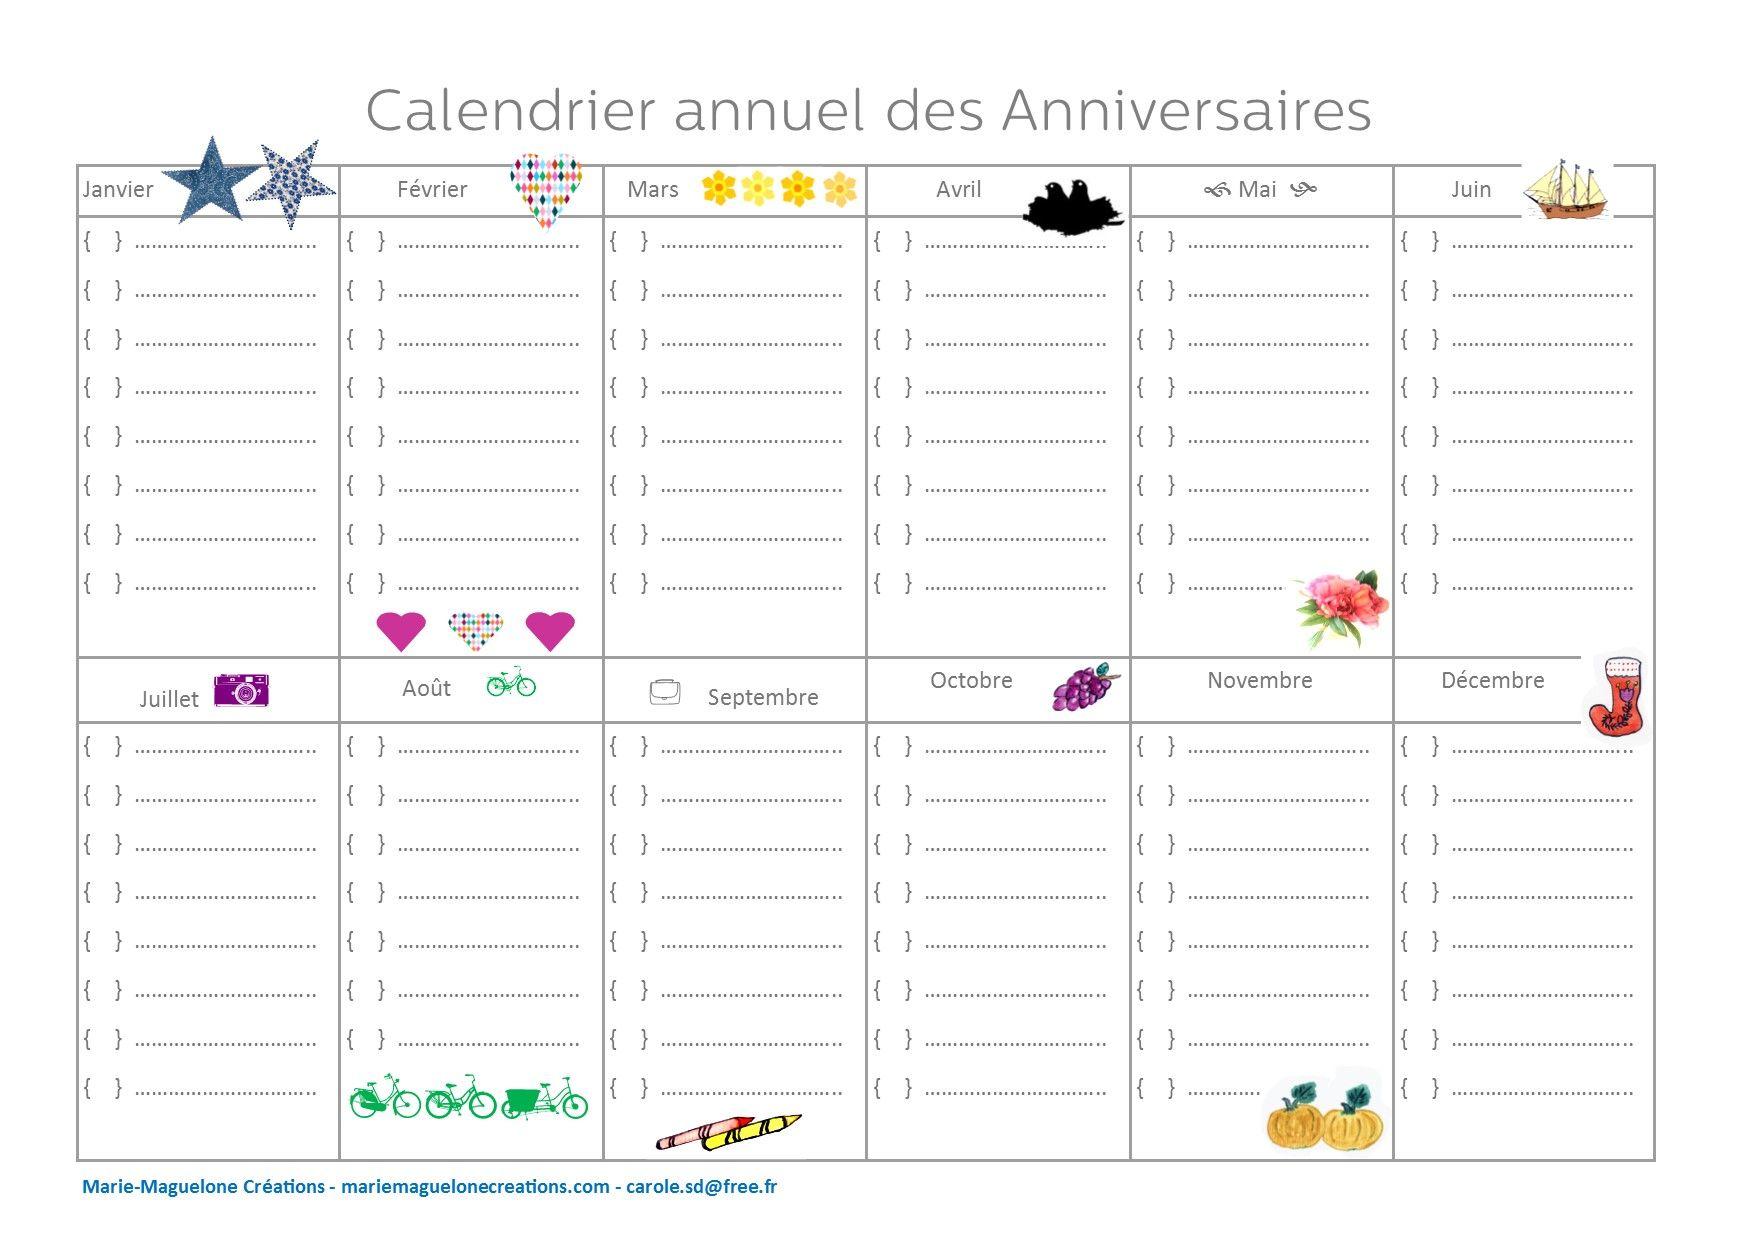 calendrier annuel des anniversaires calendrier pinterest calendrier annuel calendrier et. Black Bedroom Furniture Sets. Home Design Ideas